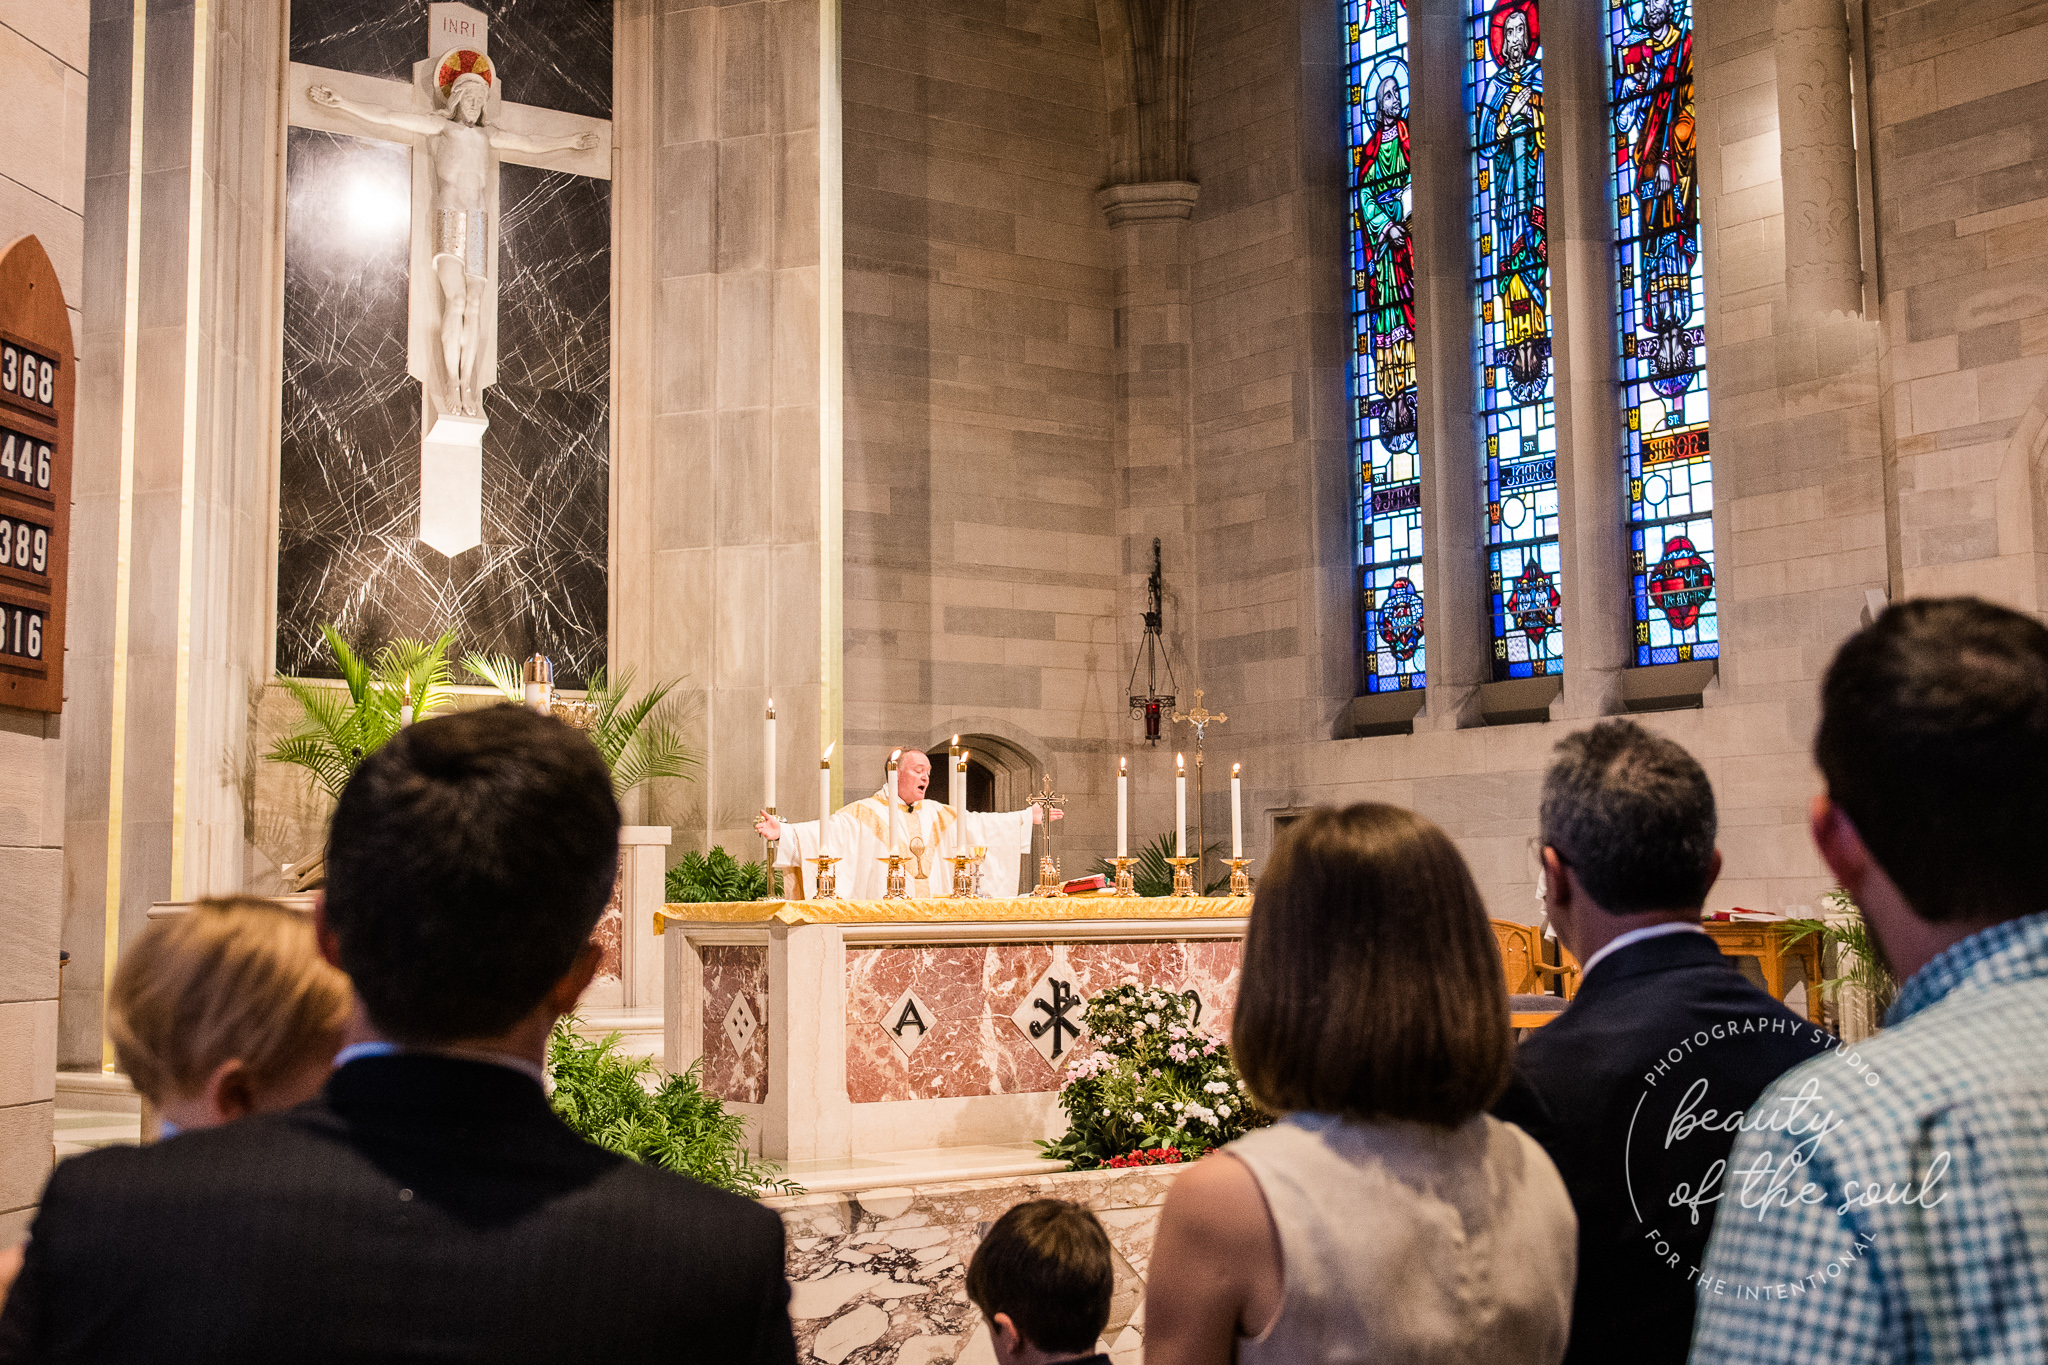 washington-dc-st-ann-catholic-church-first-holy-communion-beauty-of-the-soul-studio-may-2019-13.jpg